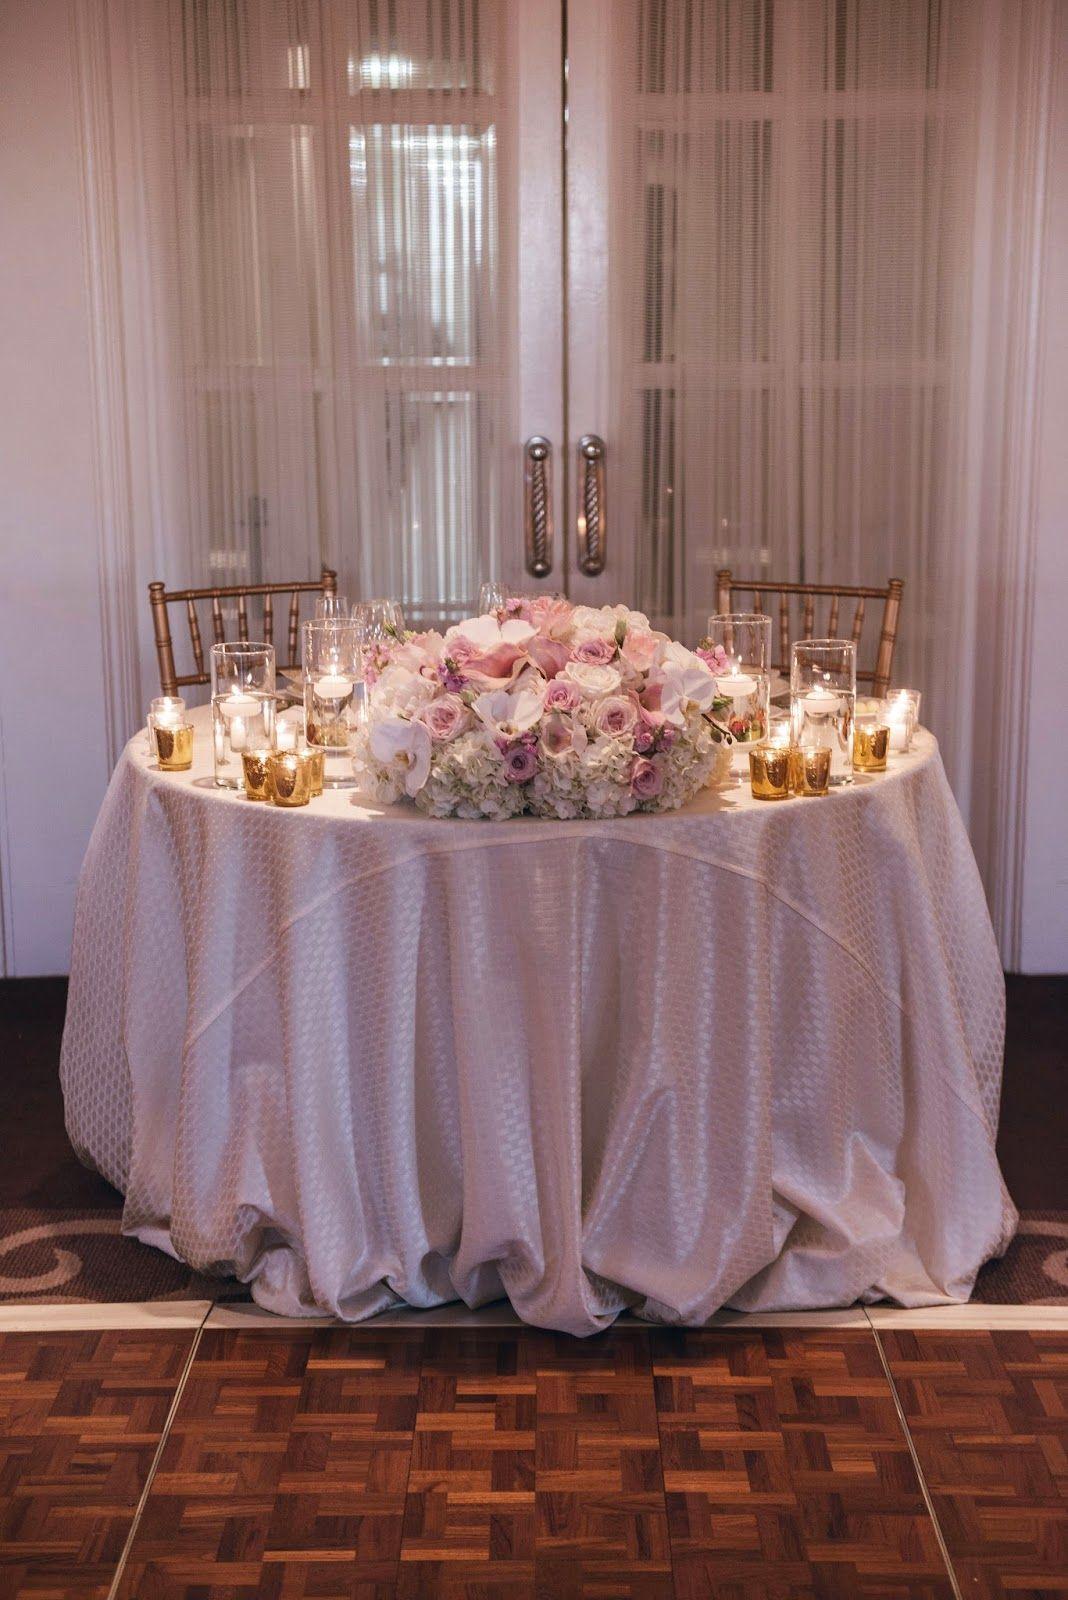 Marvelous Sweetheart Table Arrangement Centerpiece Roses Orchids Download Free Architecture Designs Scobabritishbridgeorg